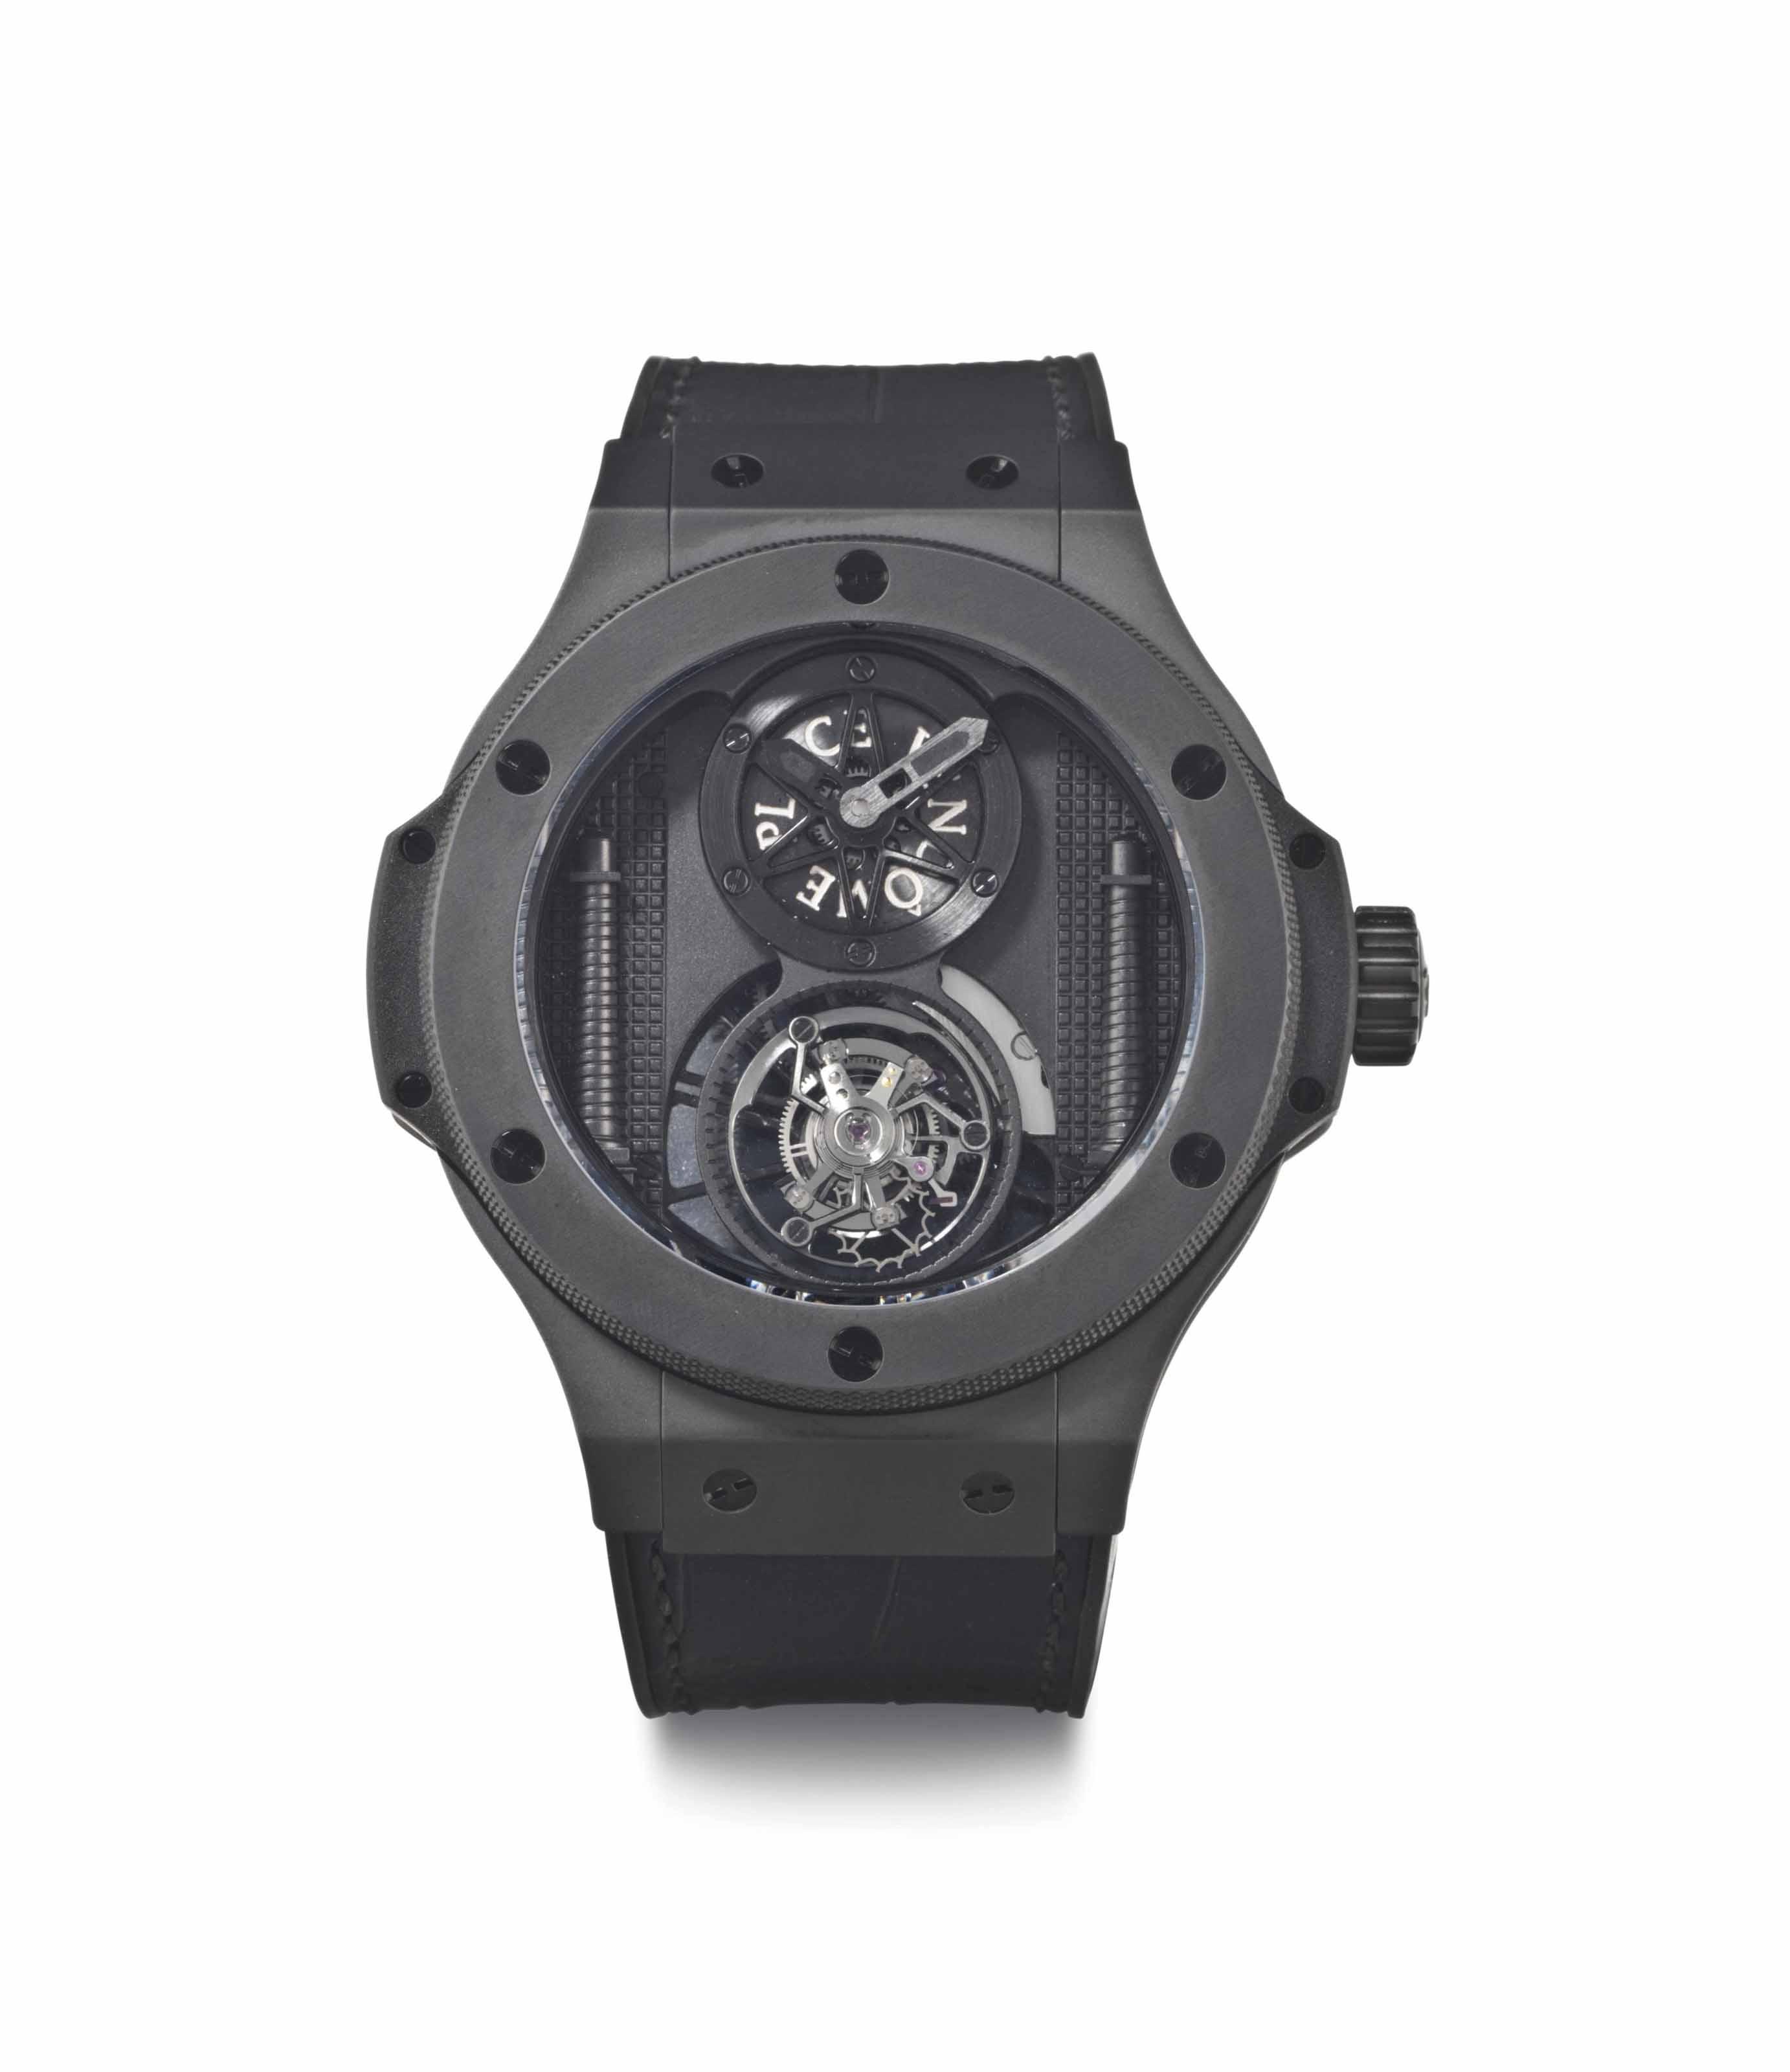 Hublot. A Limited Edition Ceramic Black Wristwatch with Tourbillon